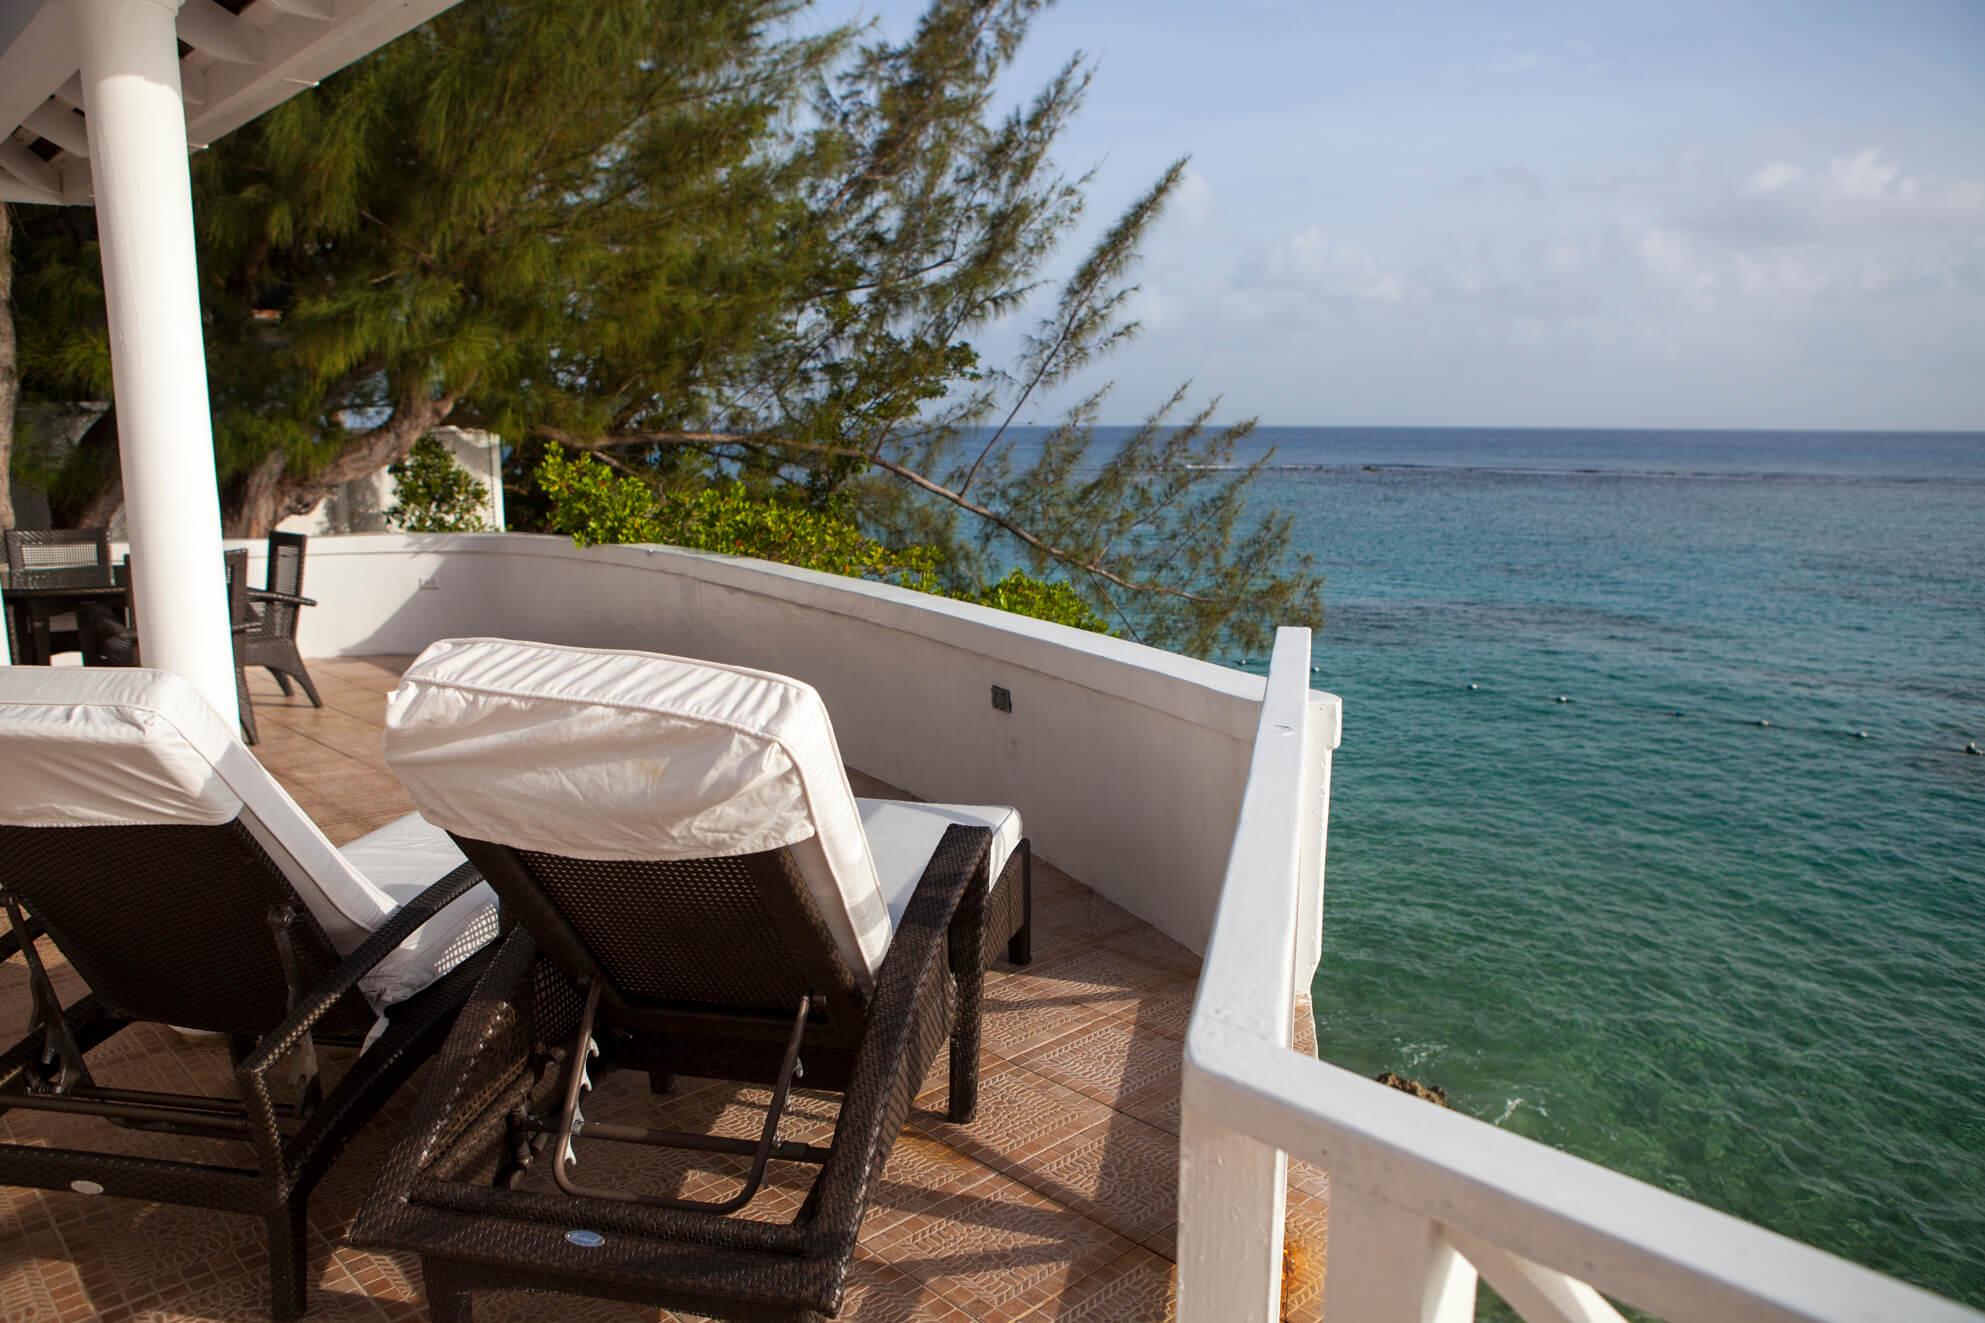 jamaica-inn-08.jpg